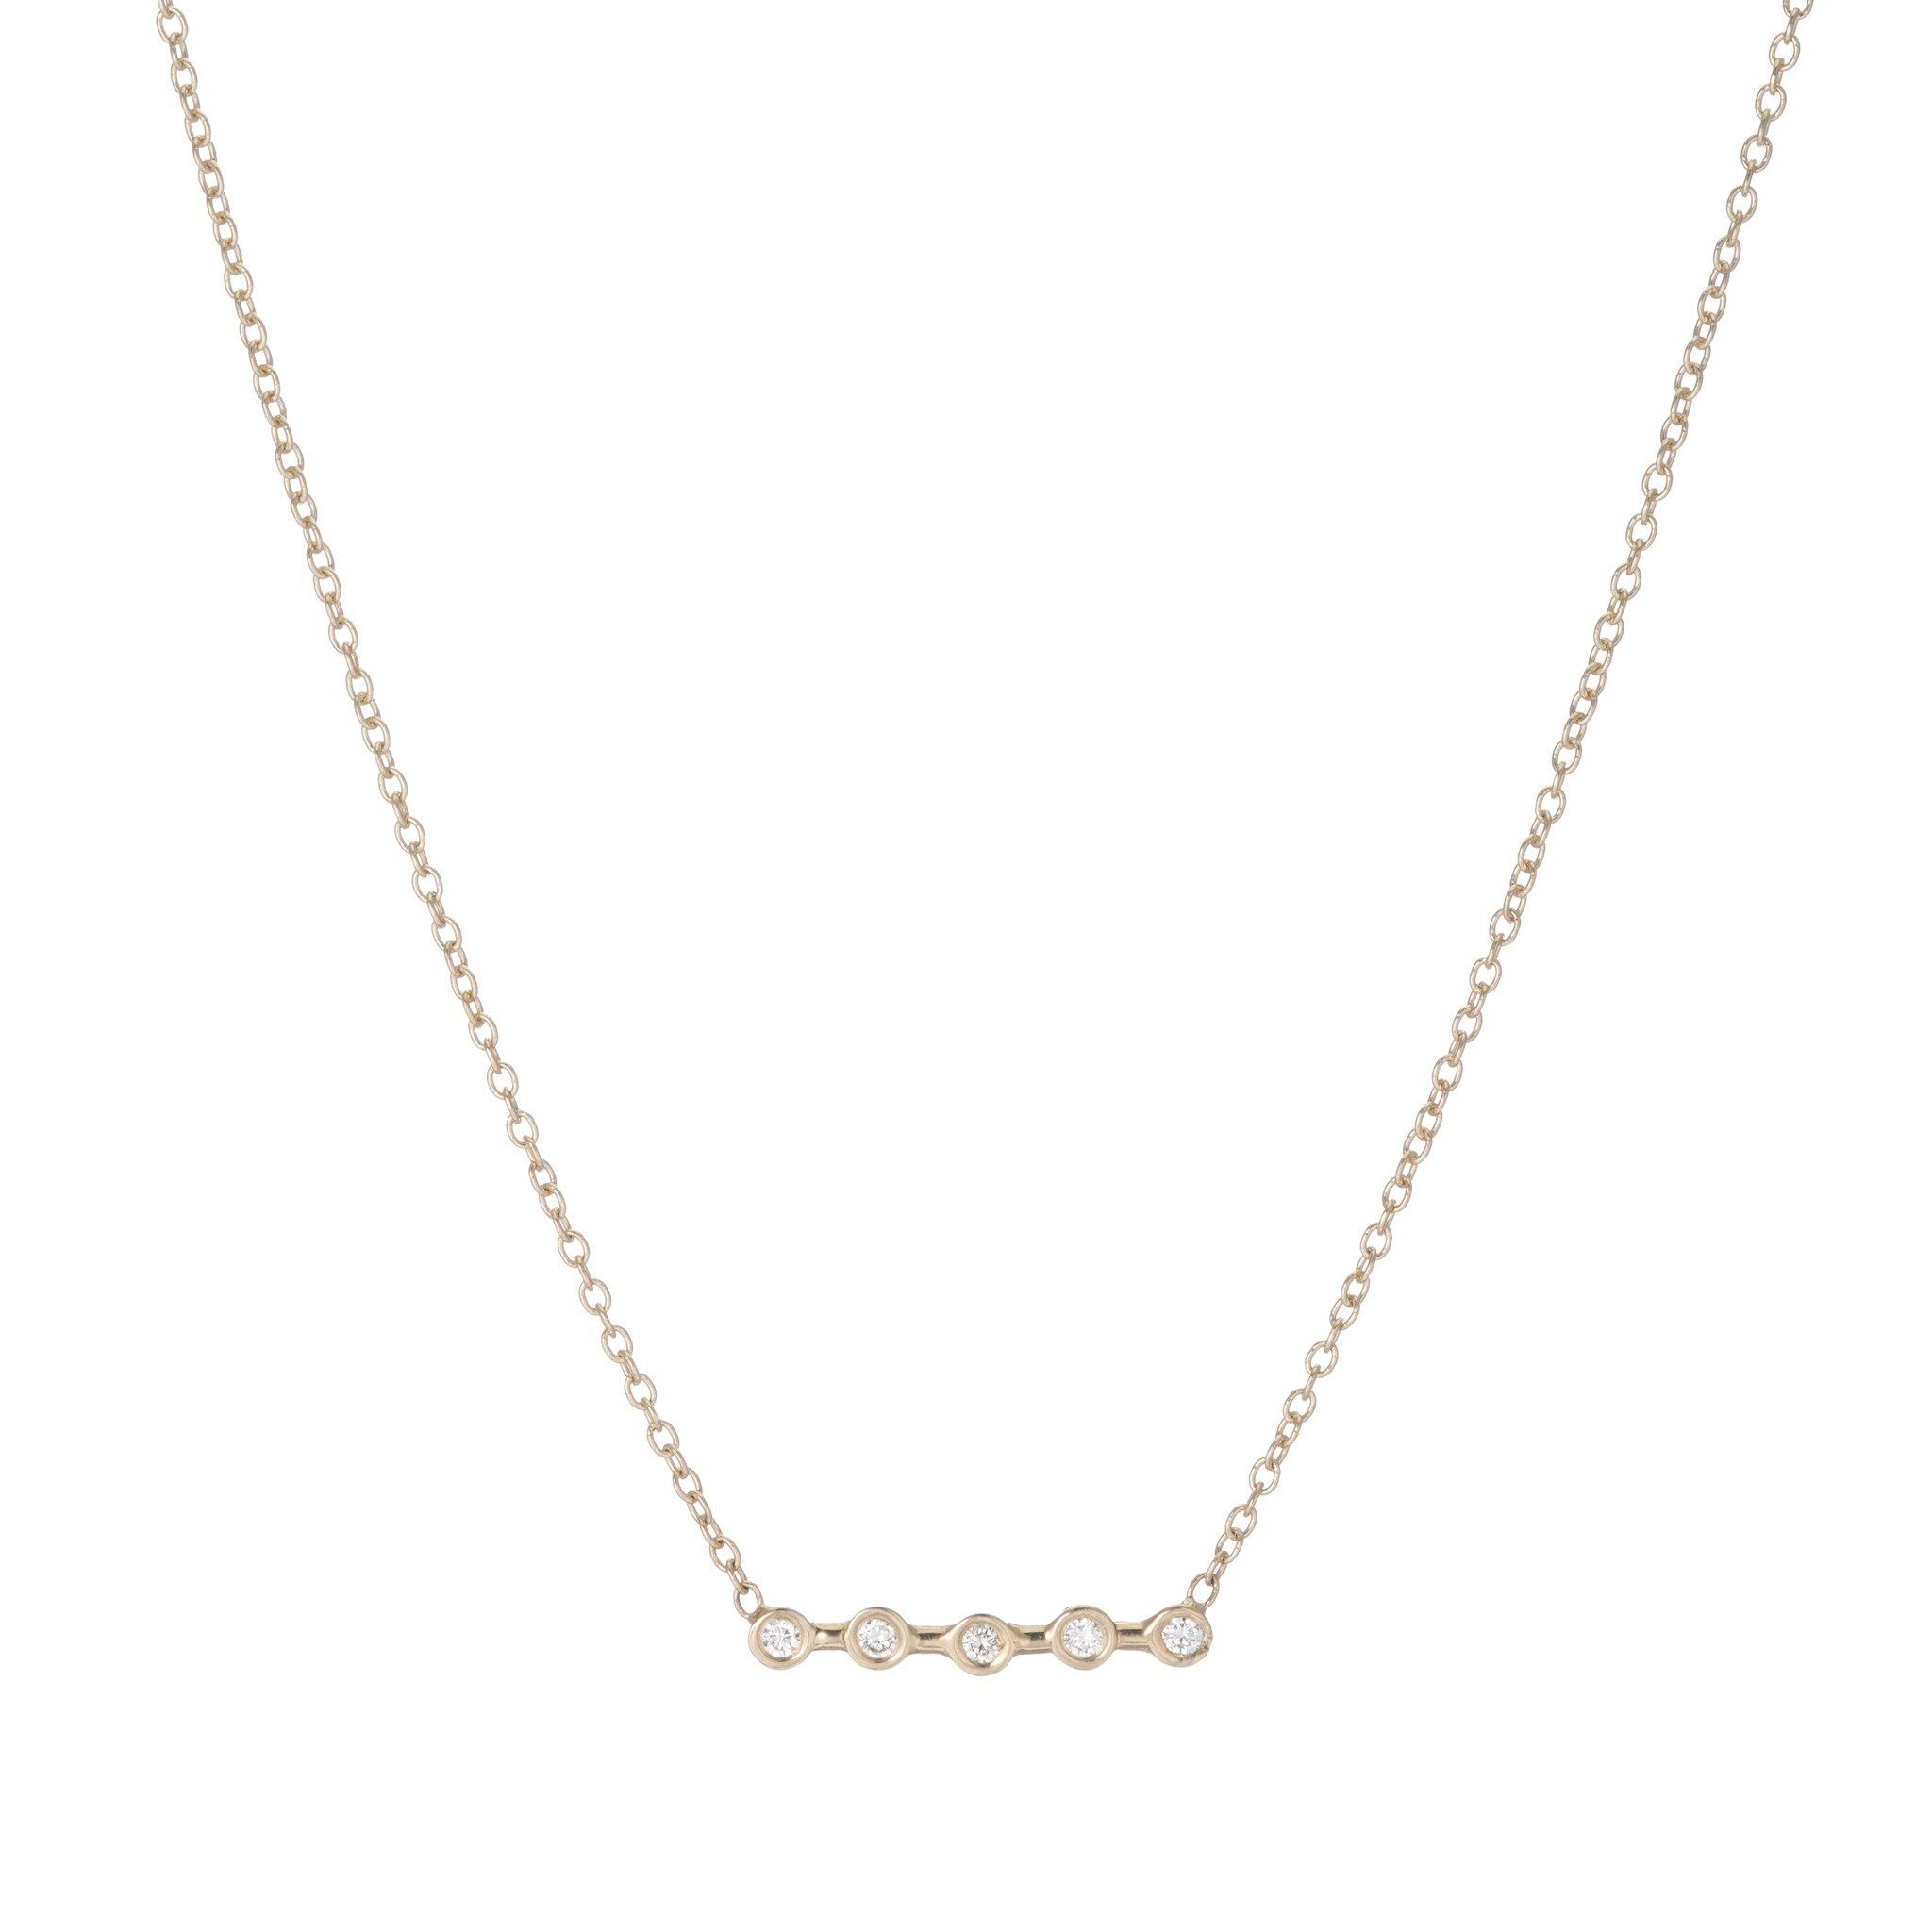 Ariel gordon jewelry diamond horizon necklace k yellow gold